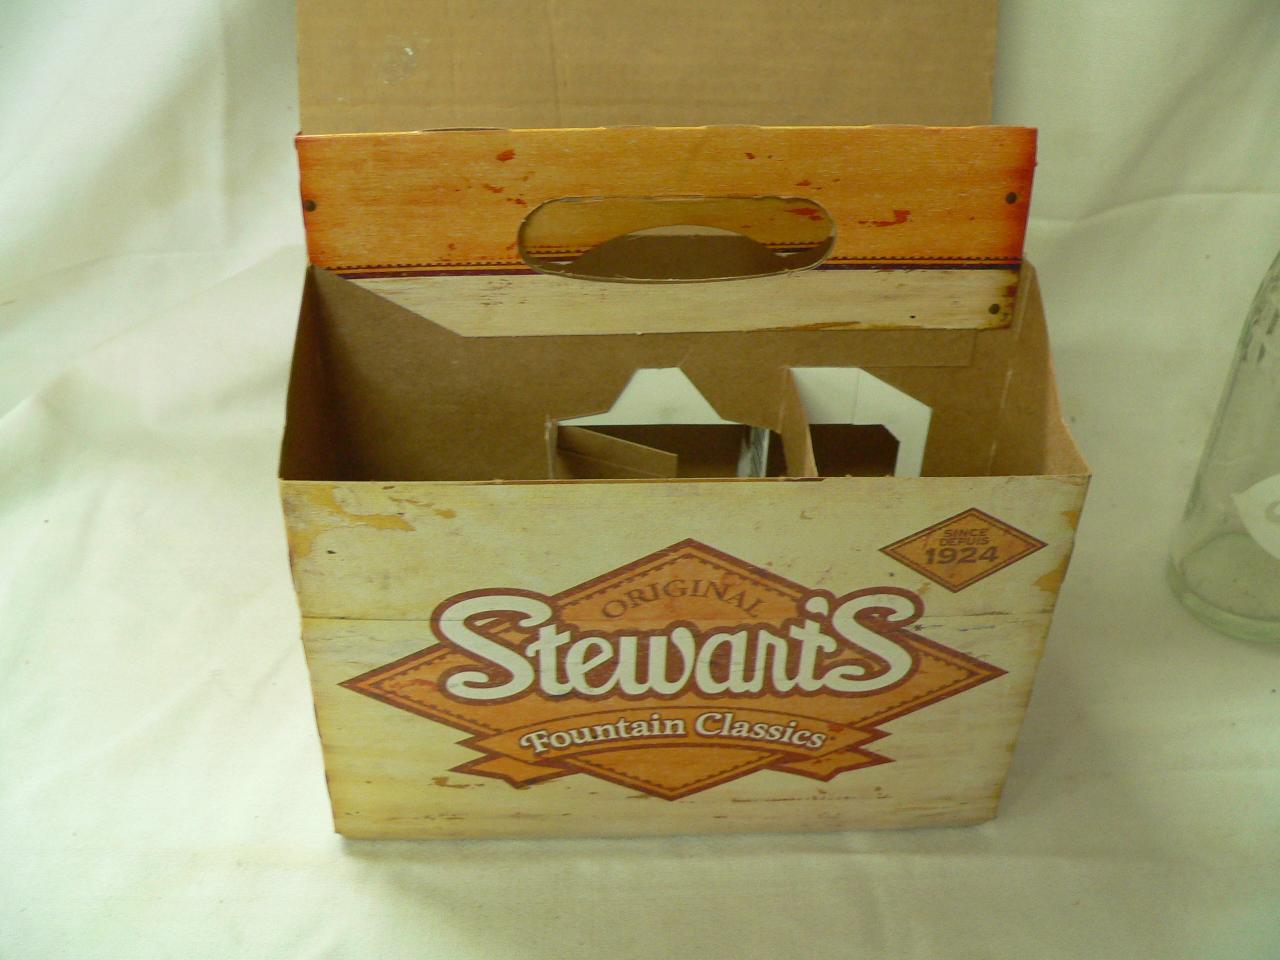 6 pack vide en carton stewart's # 4037.1